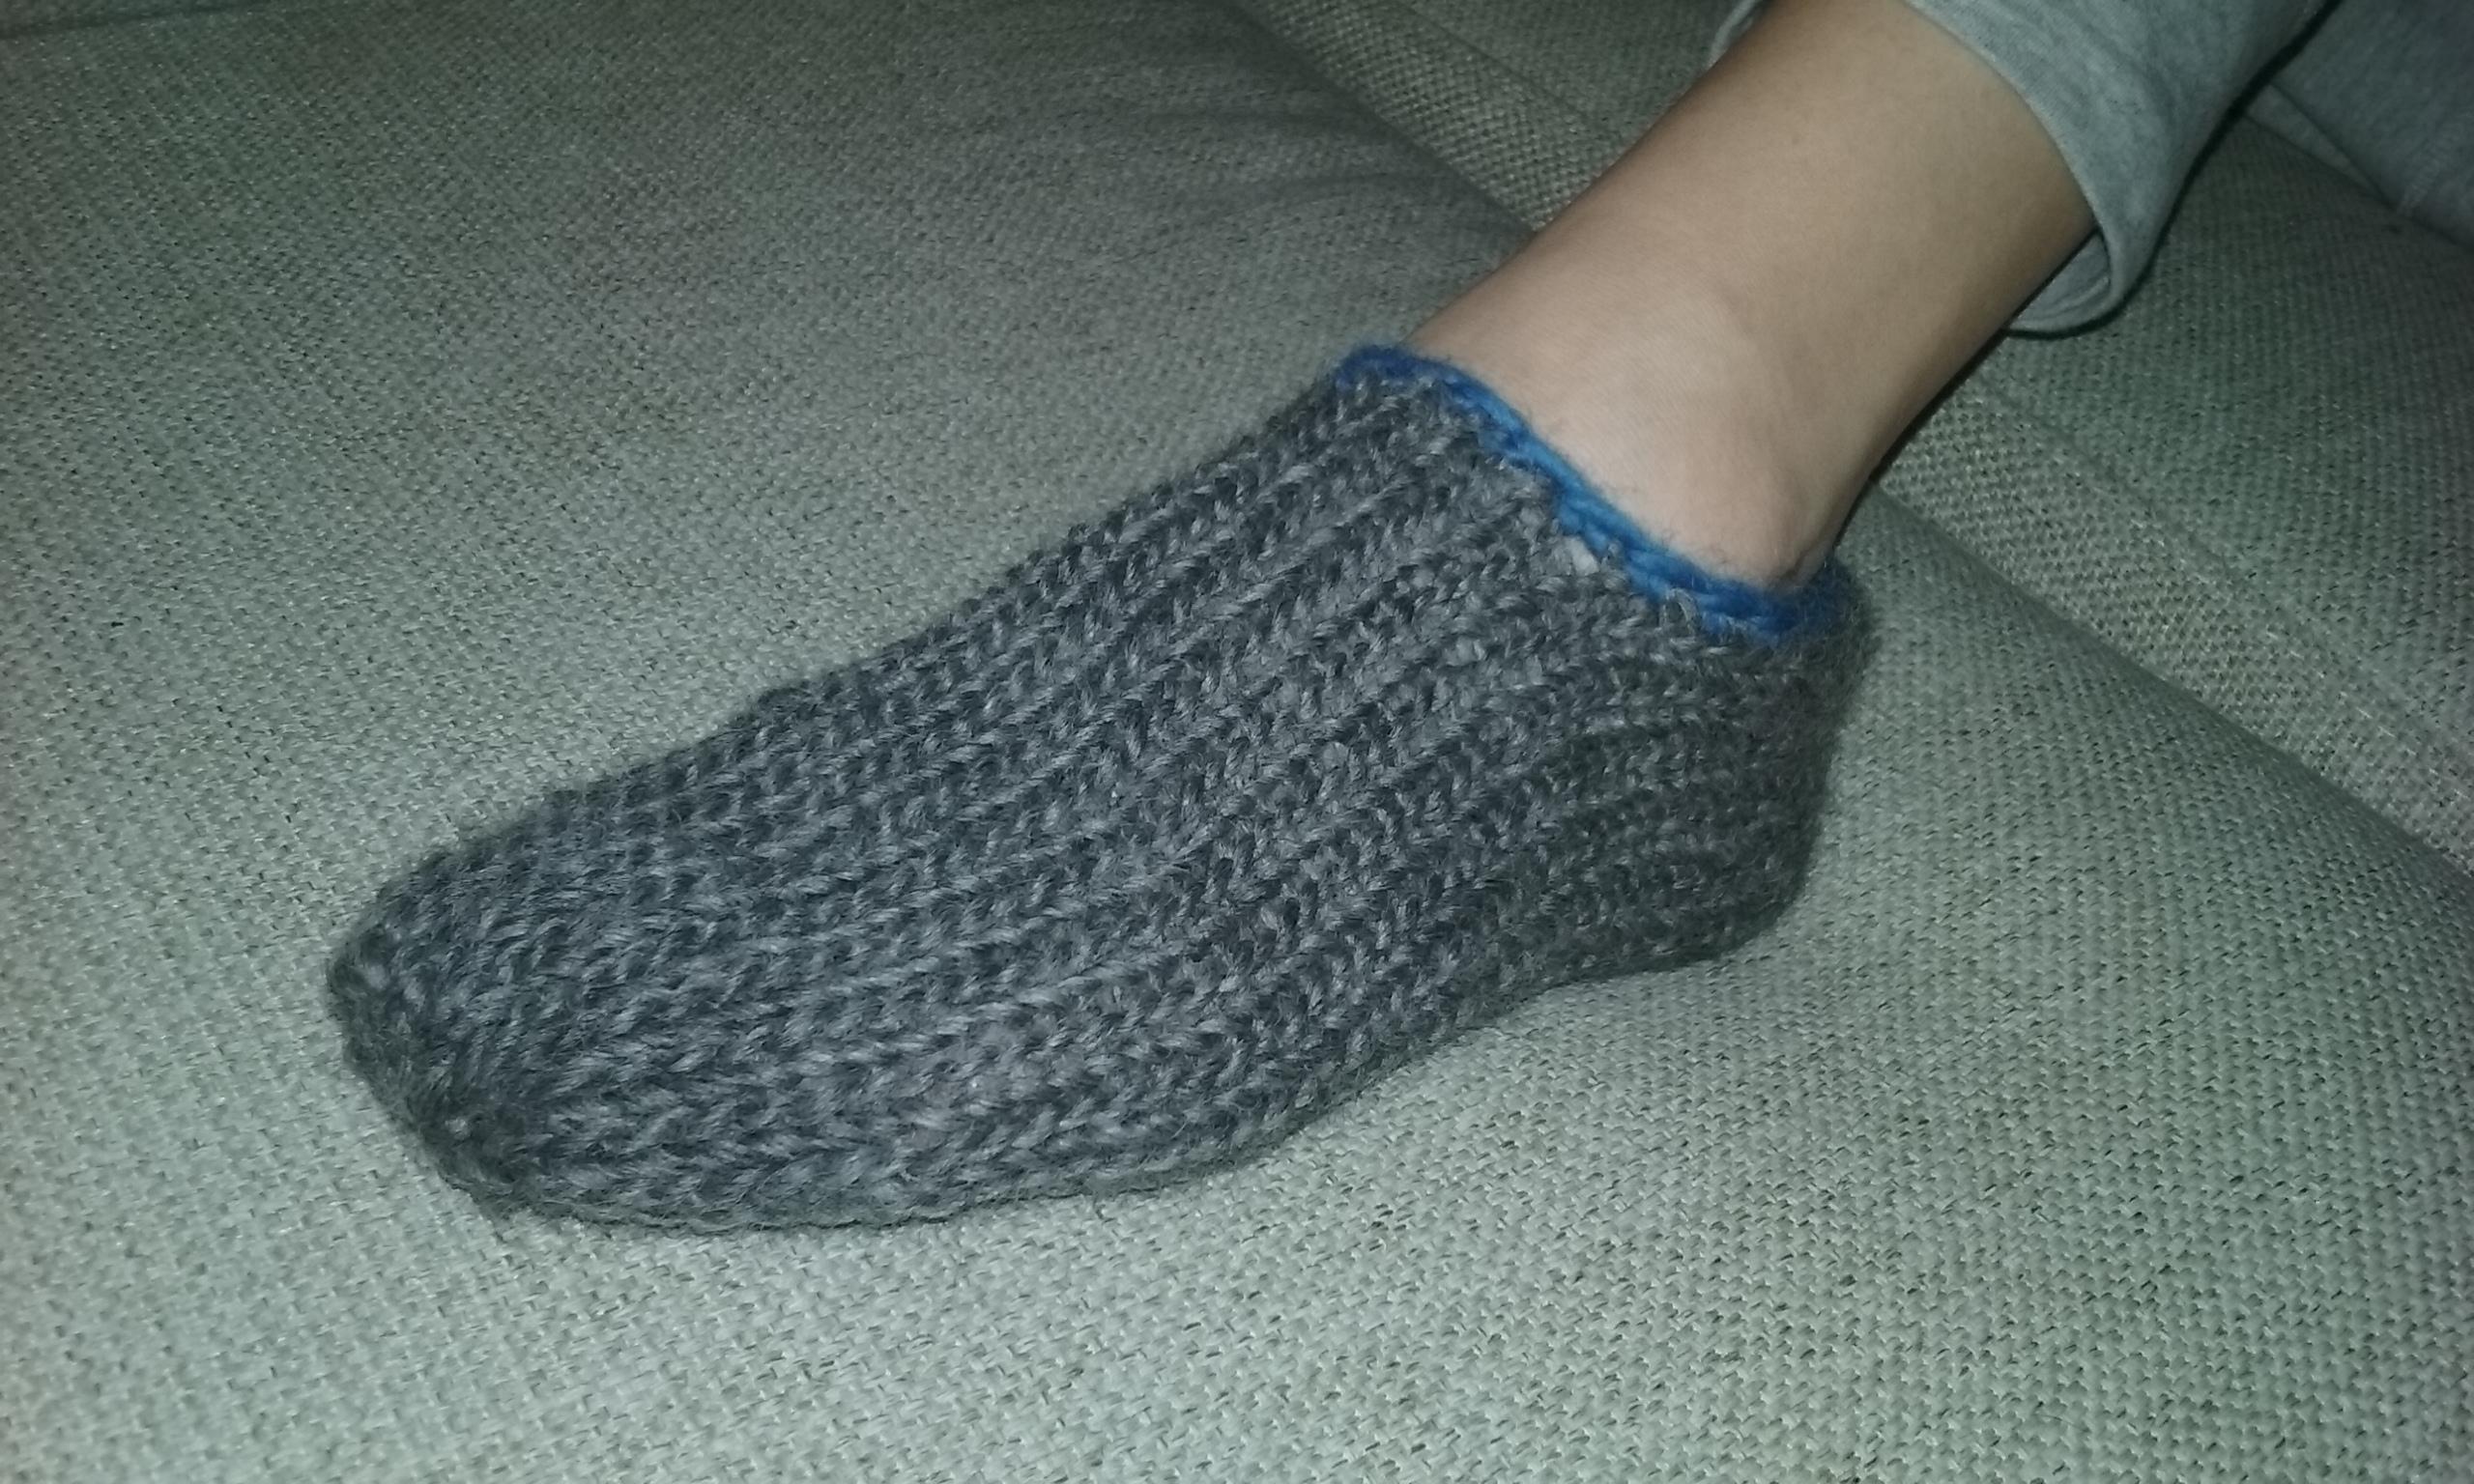 Ballerina slippers on the Addi Express